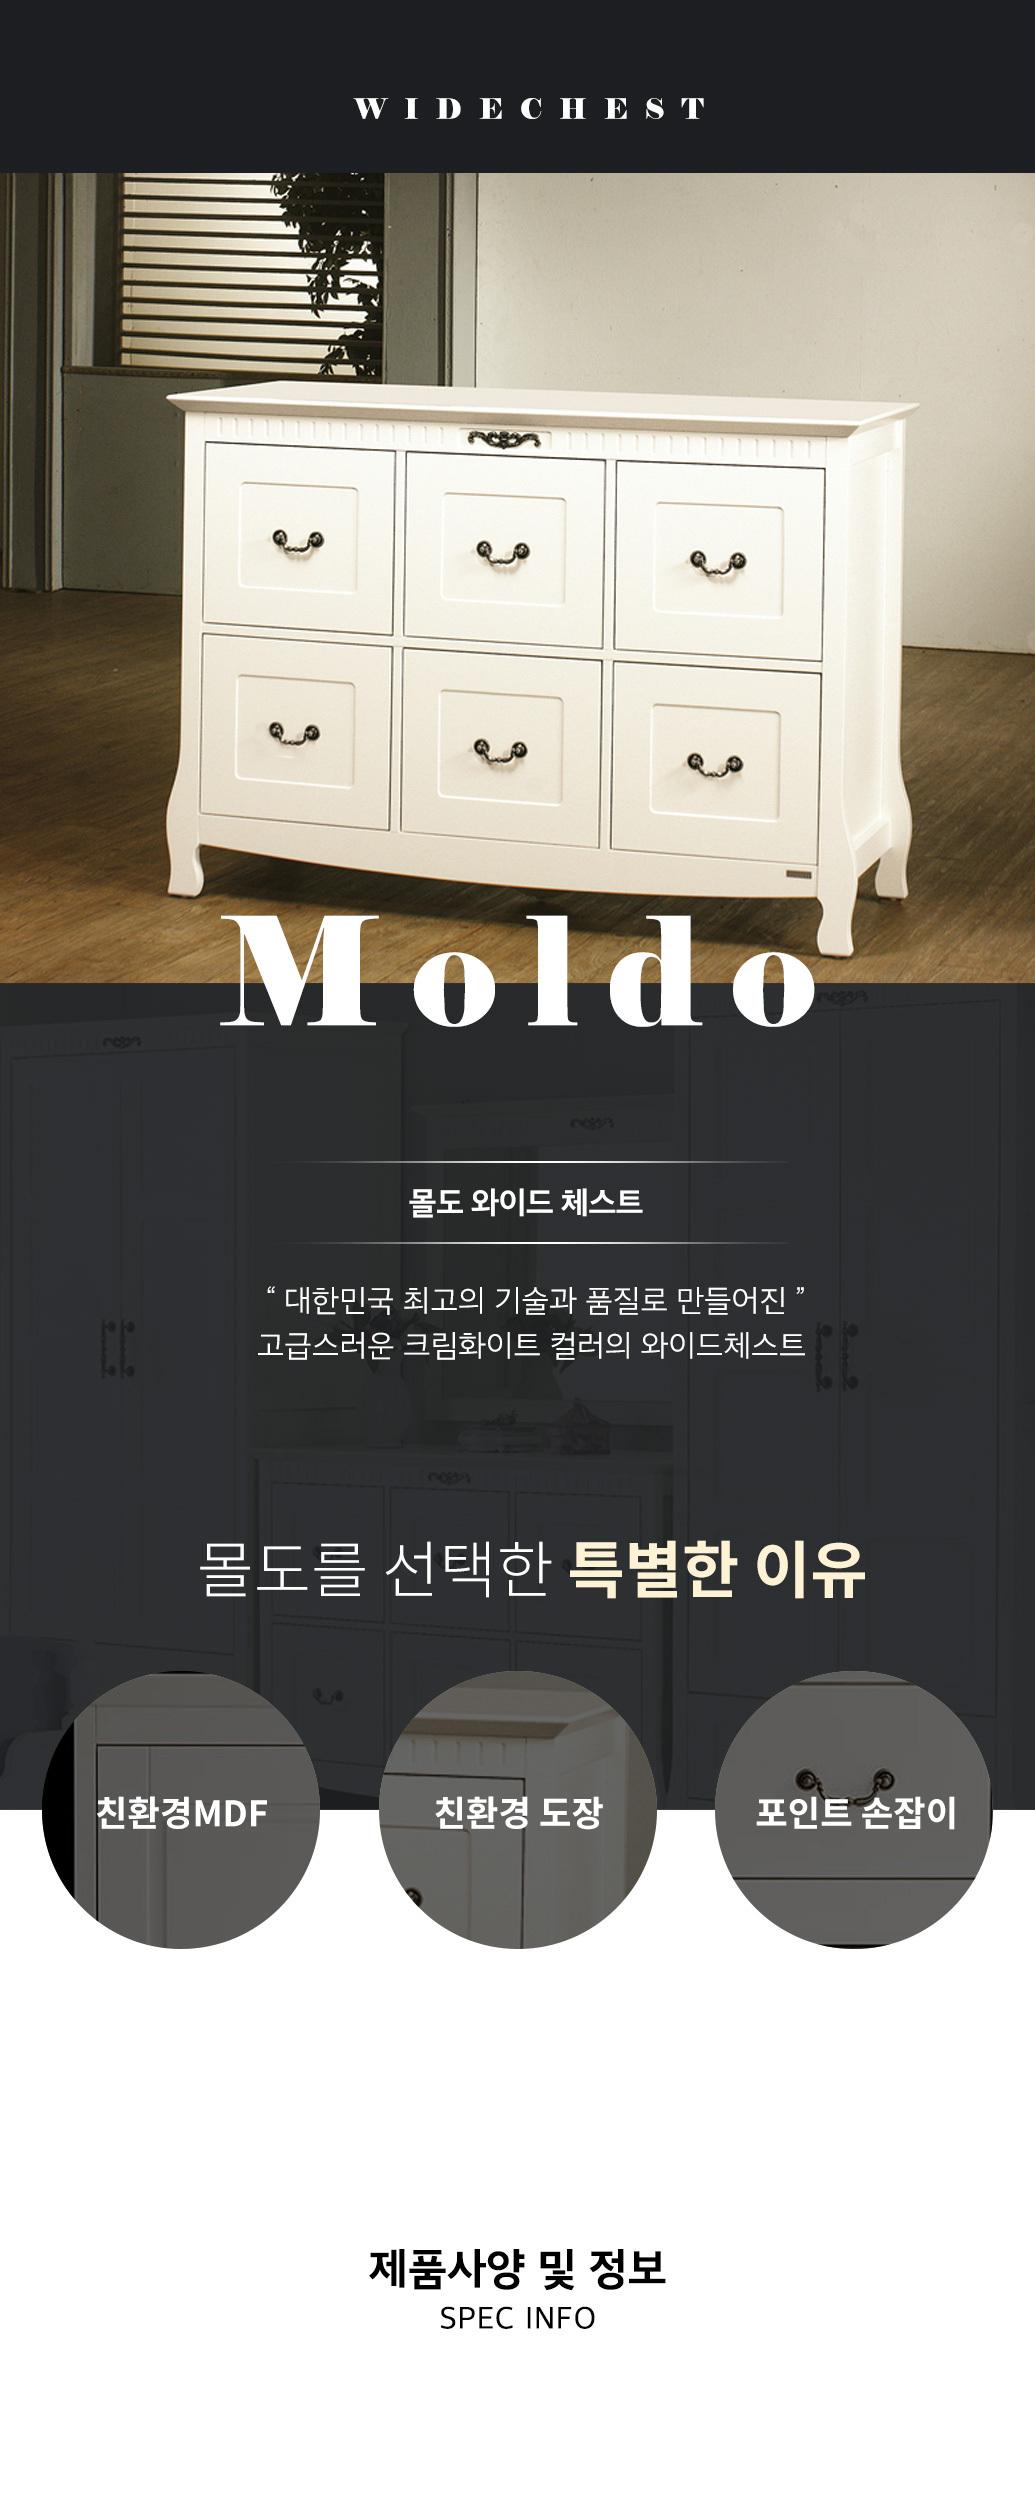 moldo_wide_01.jpg